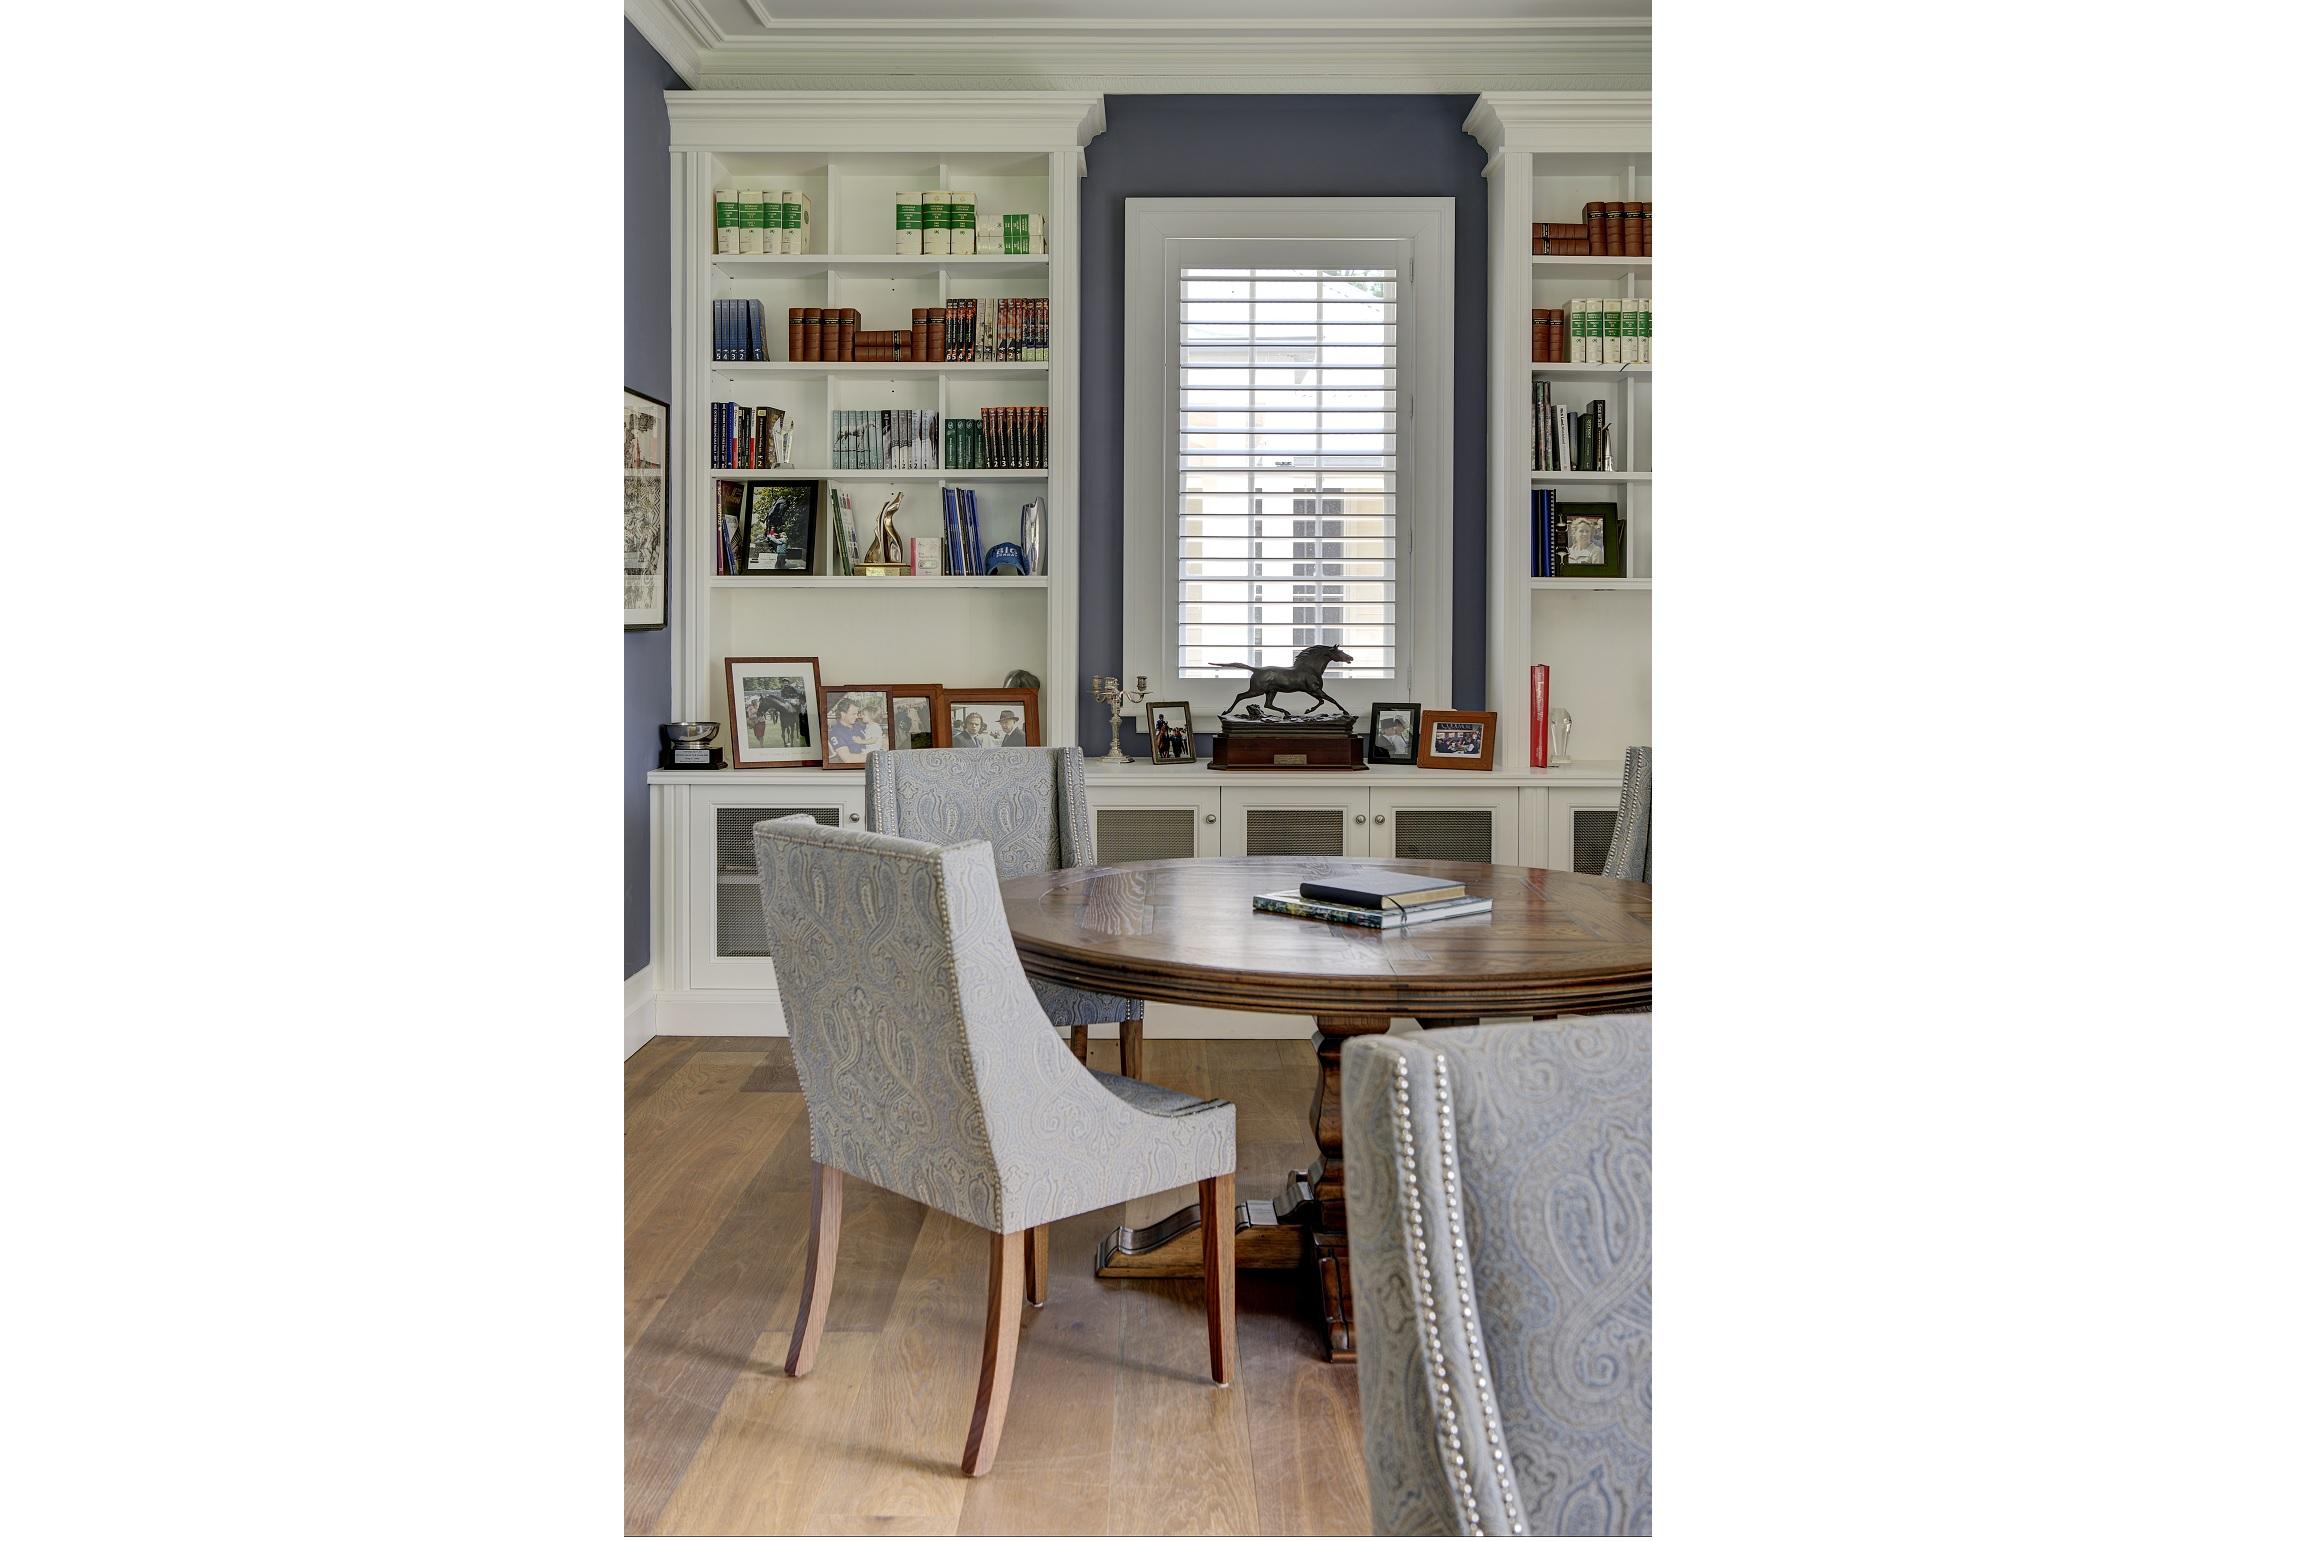 Horse-Stud-Office-Table-Armchair-Interior-Decor-Hunter-Valley-Michael-Bell-Architects-Sydney